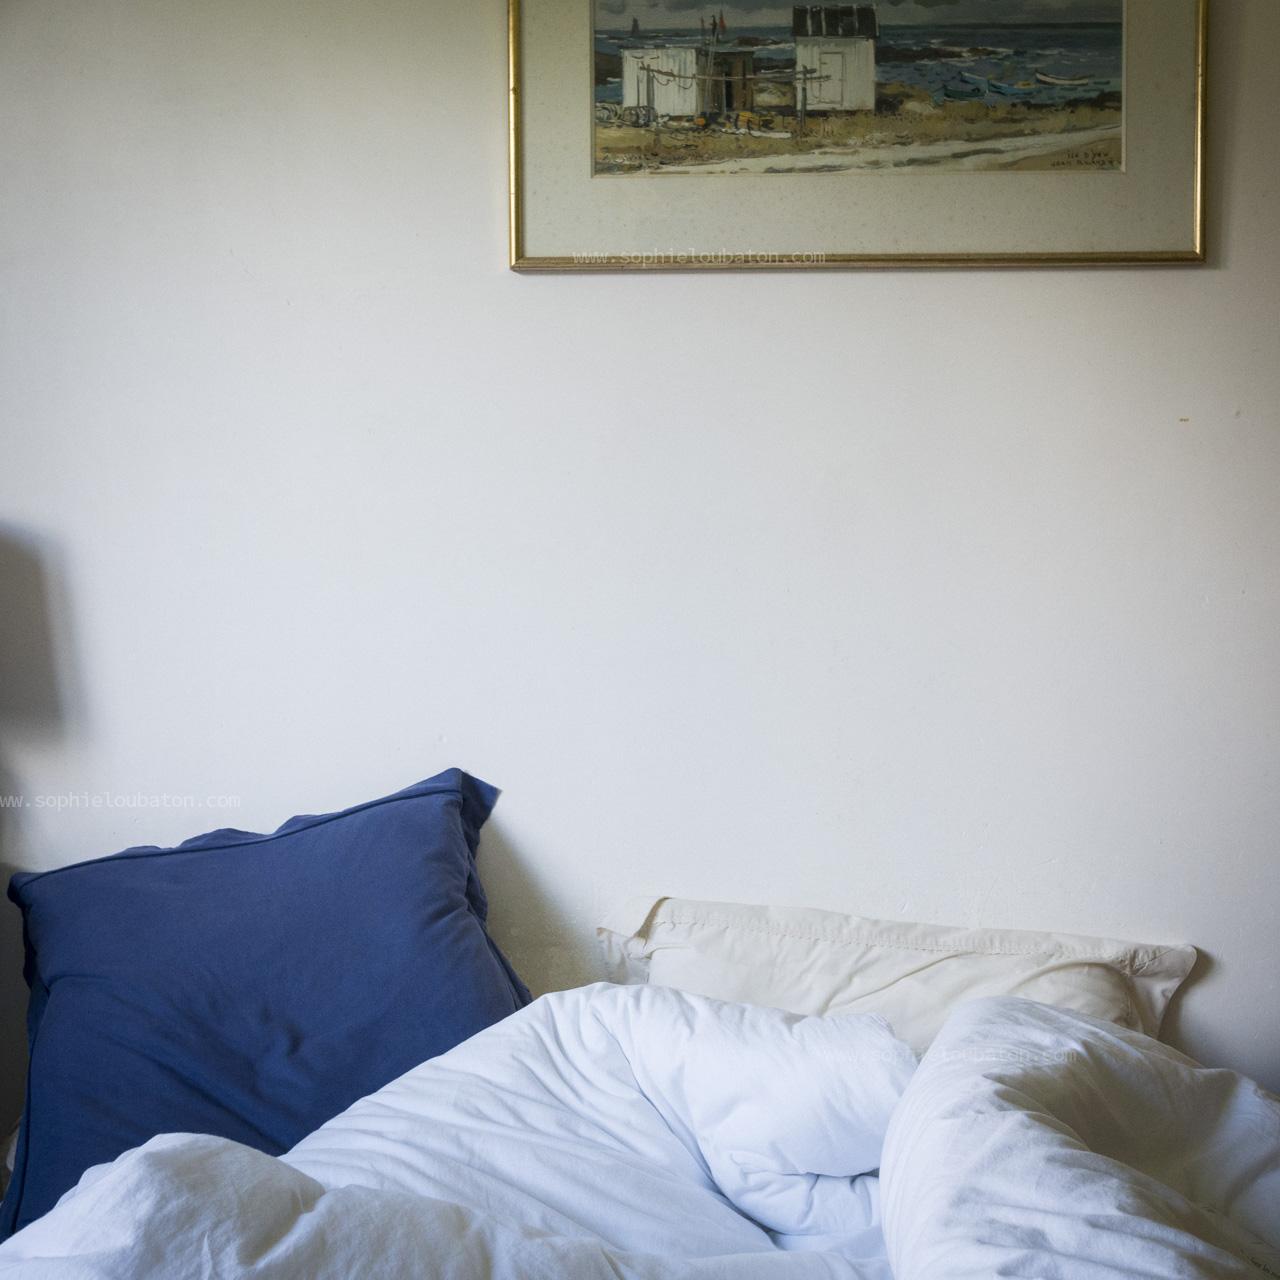 lits où j'ai dormi